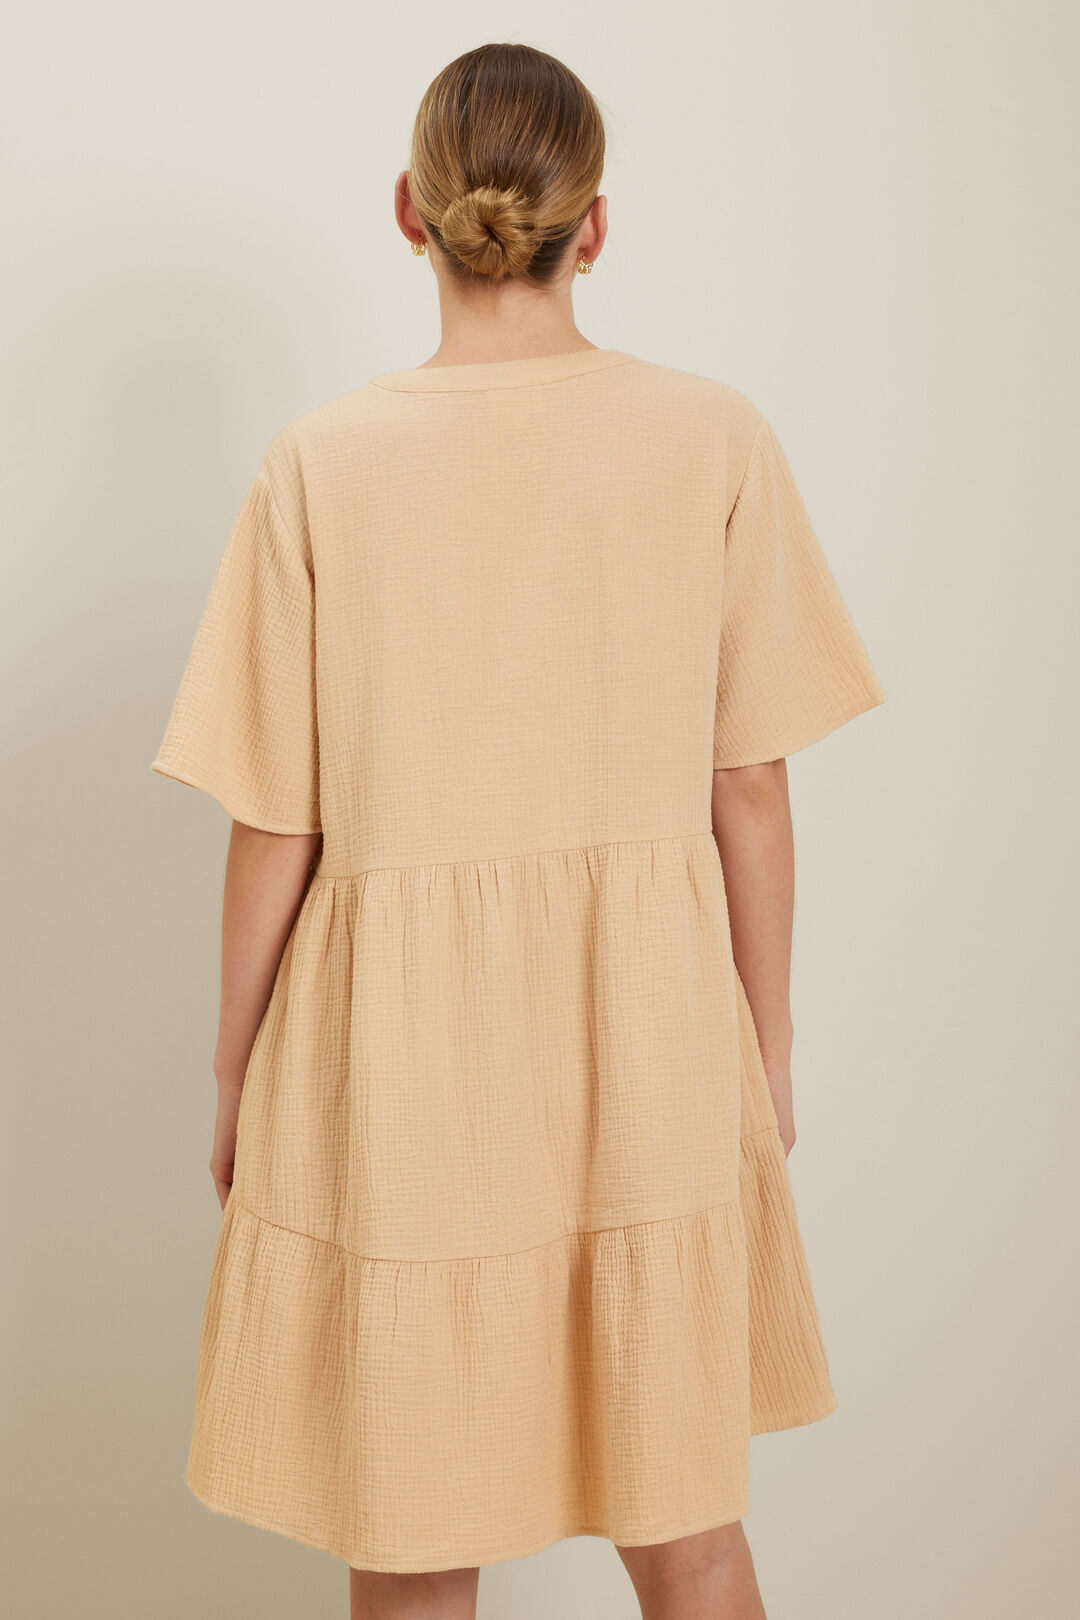 Tiered V Neck Mini Dress  Neutral Sand  hi-res